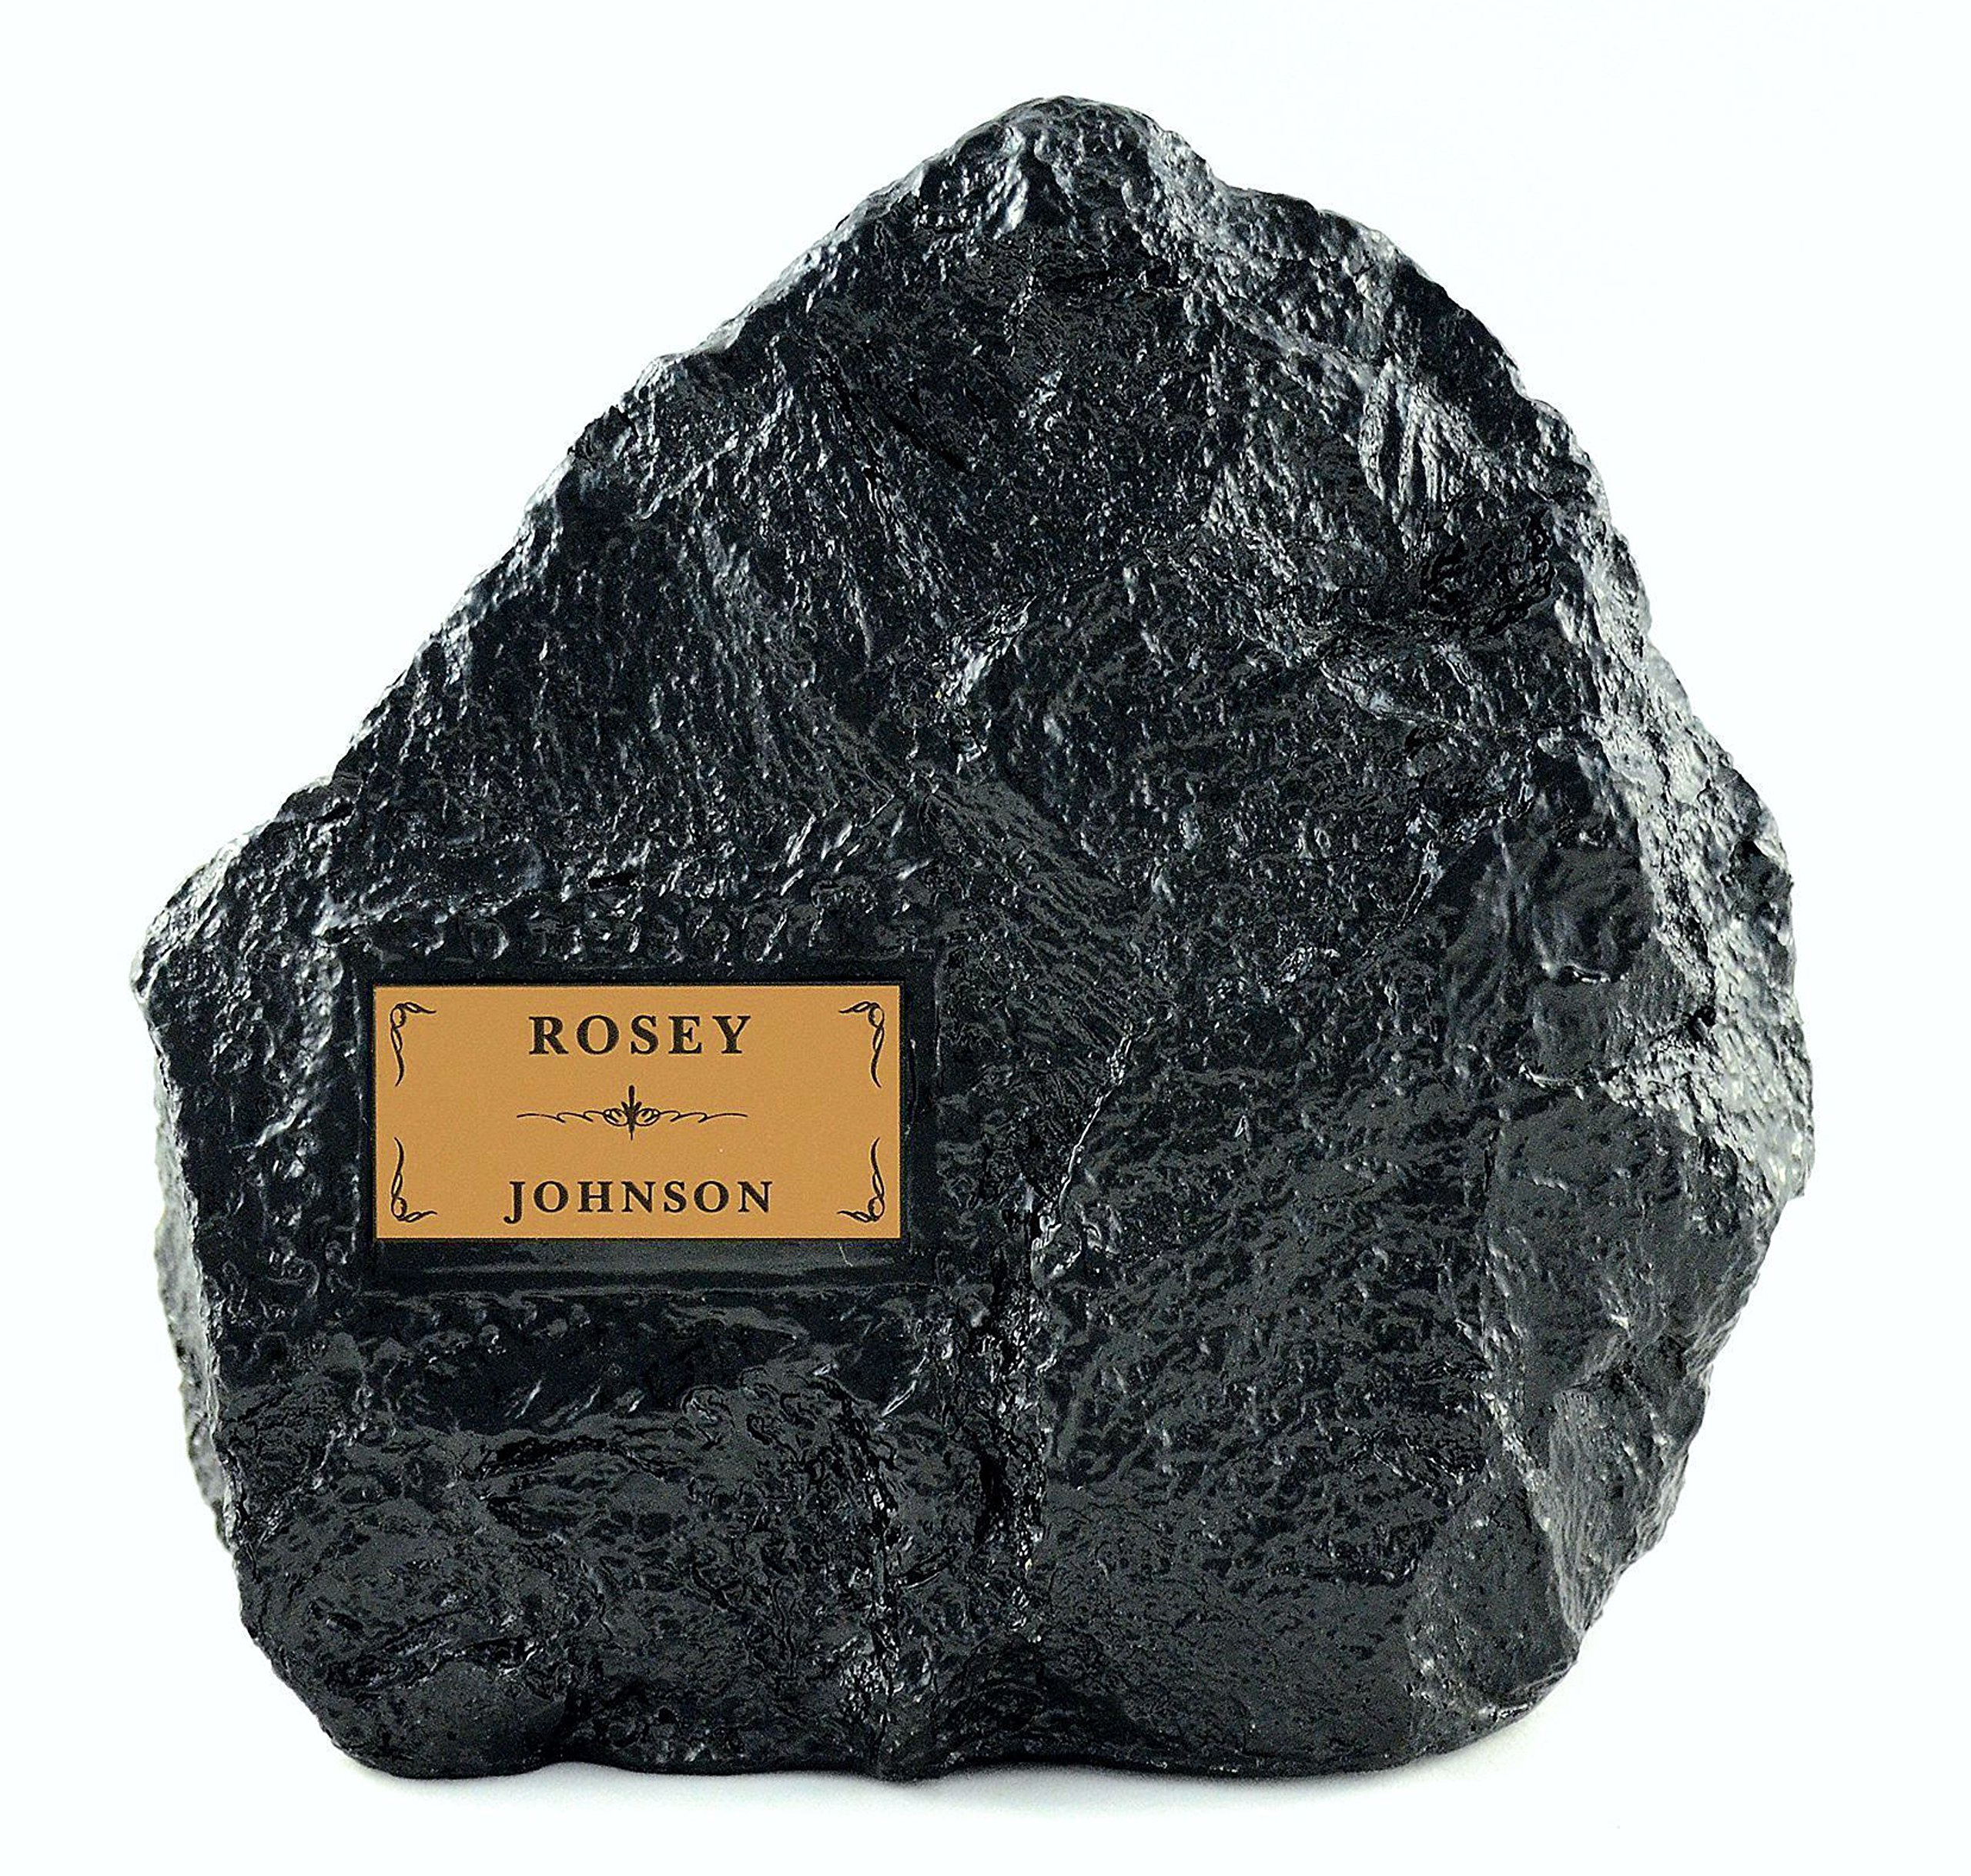 Granite Garden Rock Pet Cremation Urn, Large